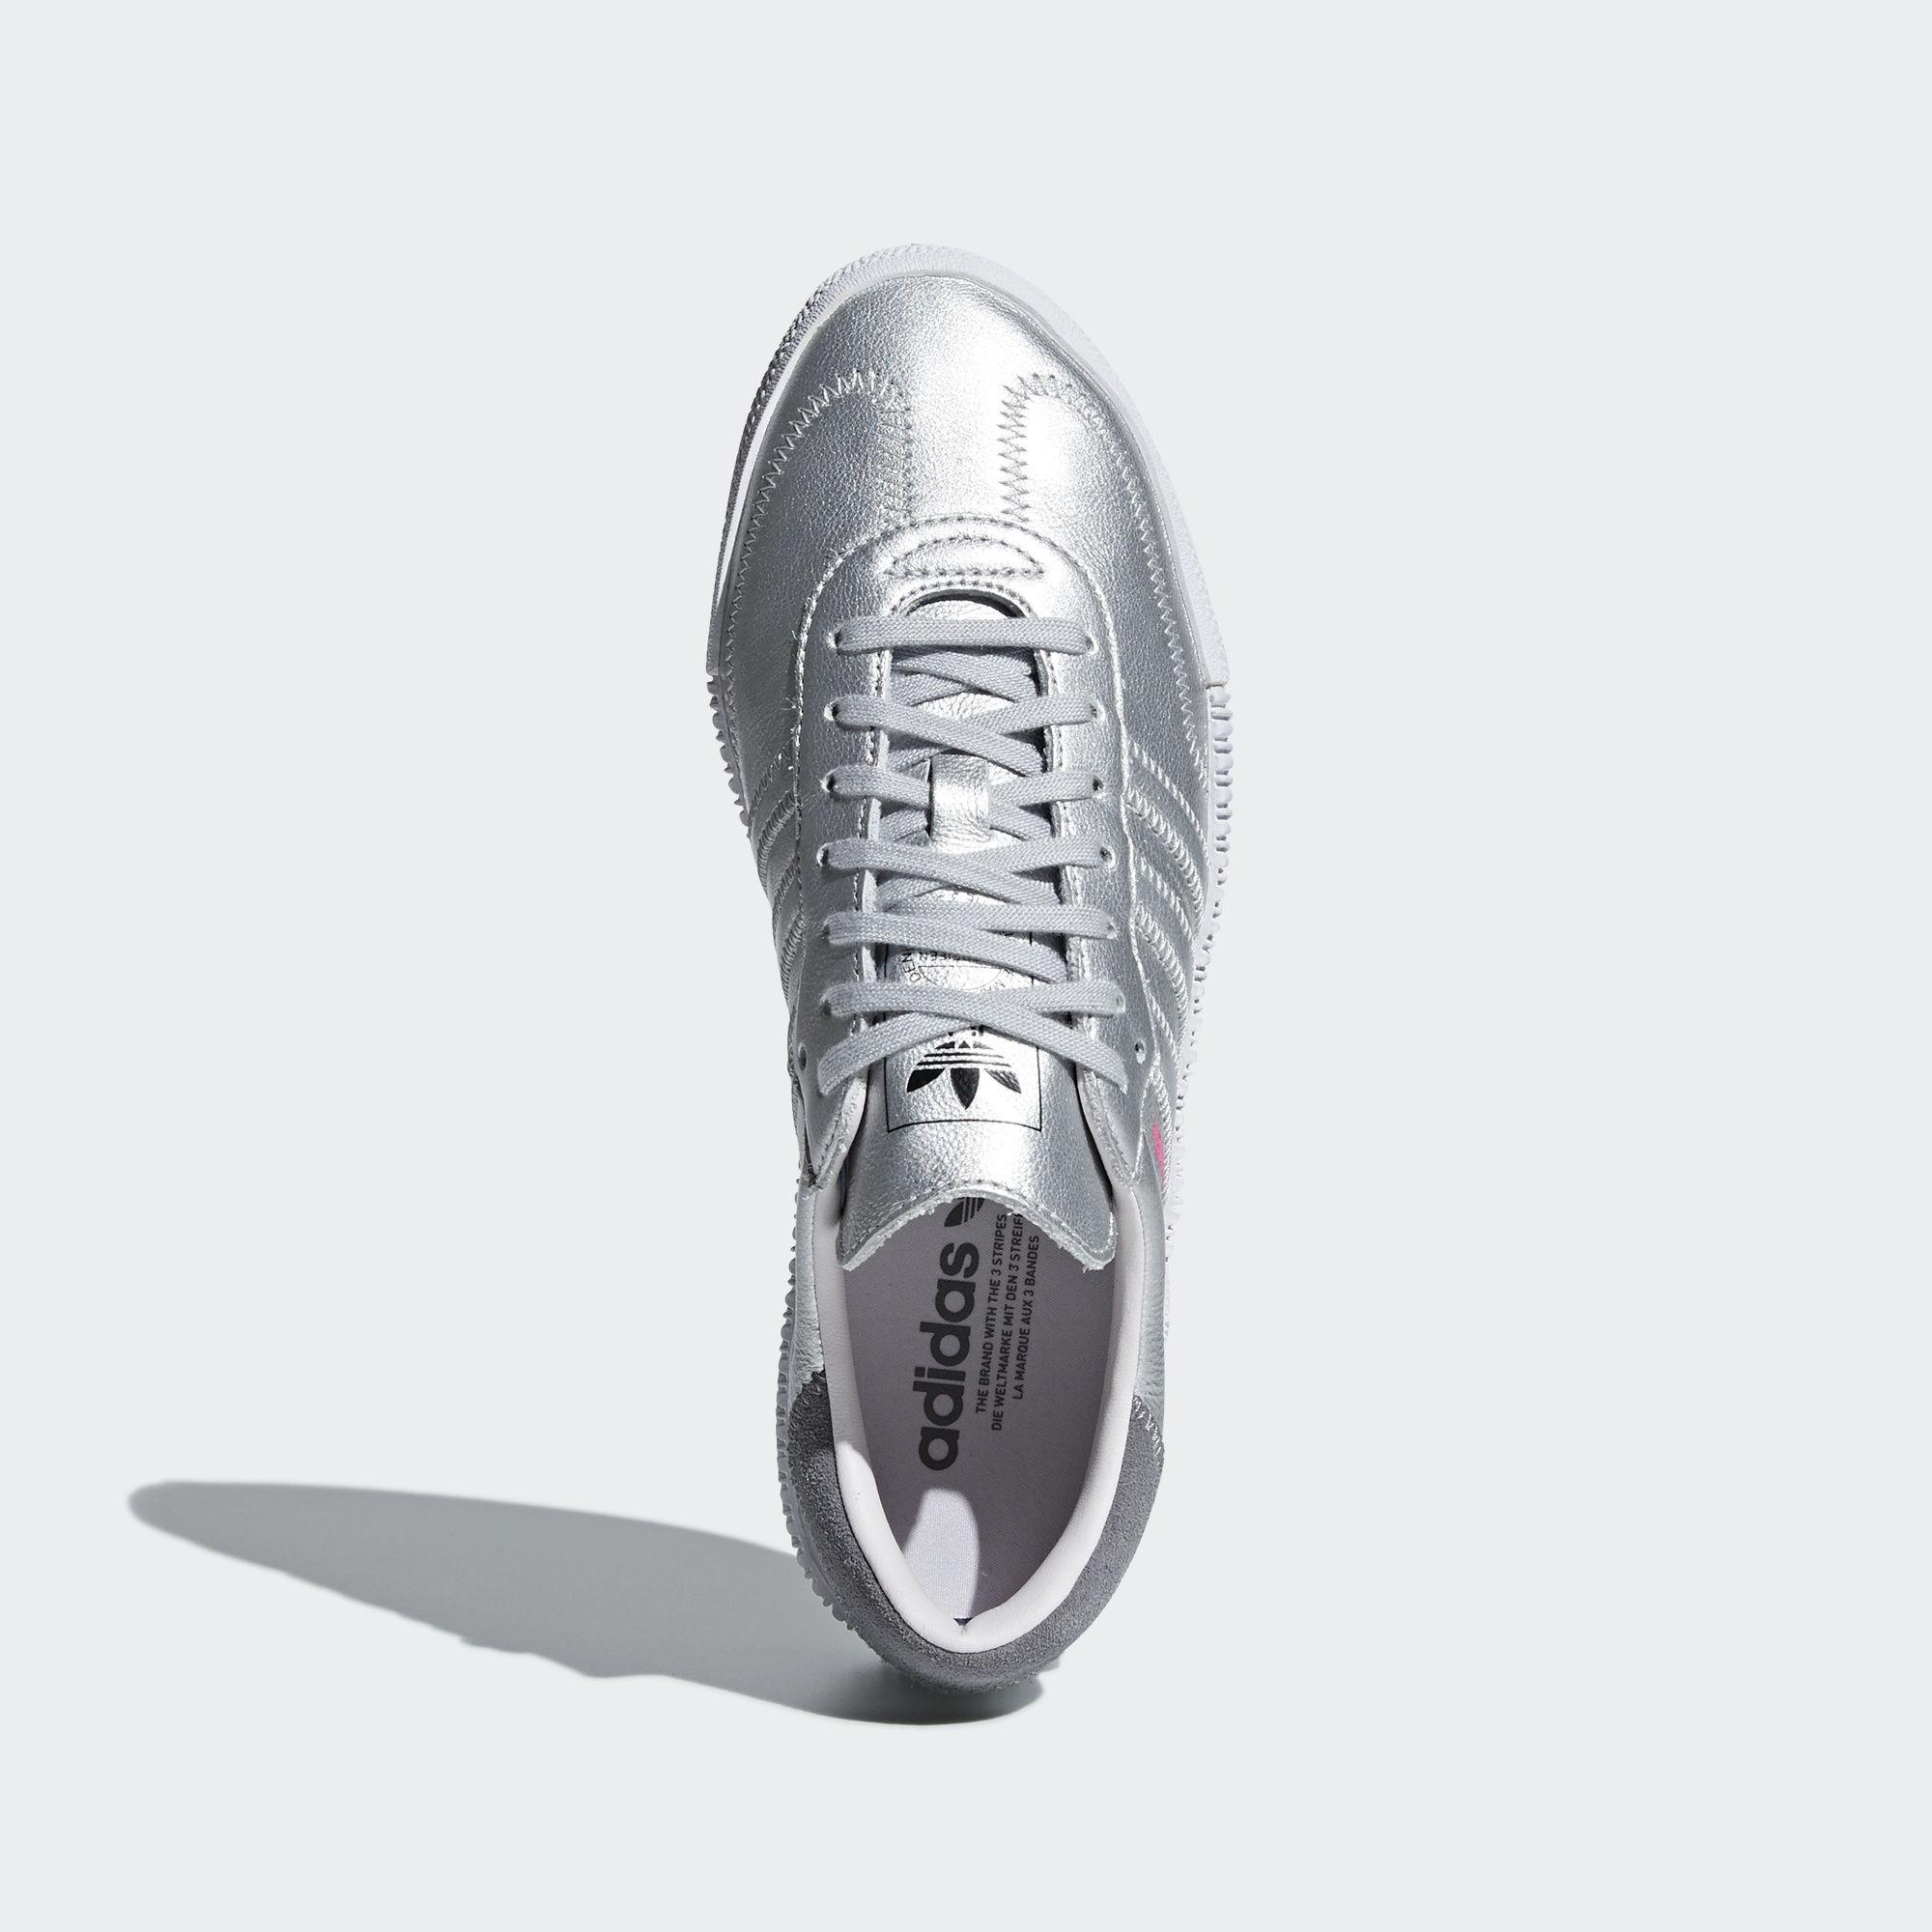 8e0a9687983c Adidas Originals - Adidas Sambarose W Silver Metallic  Silver Metallic  Orchid  Tint - Lyst. View fullscreen